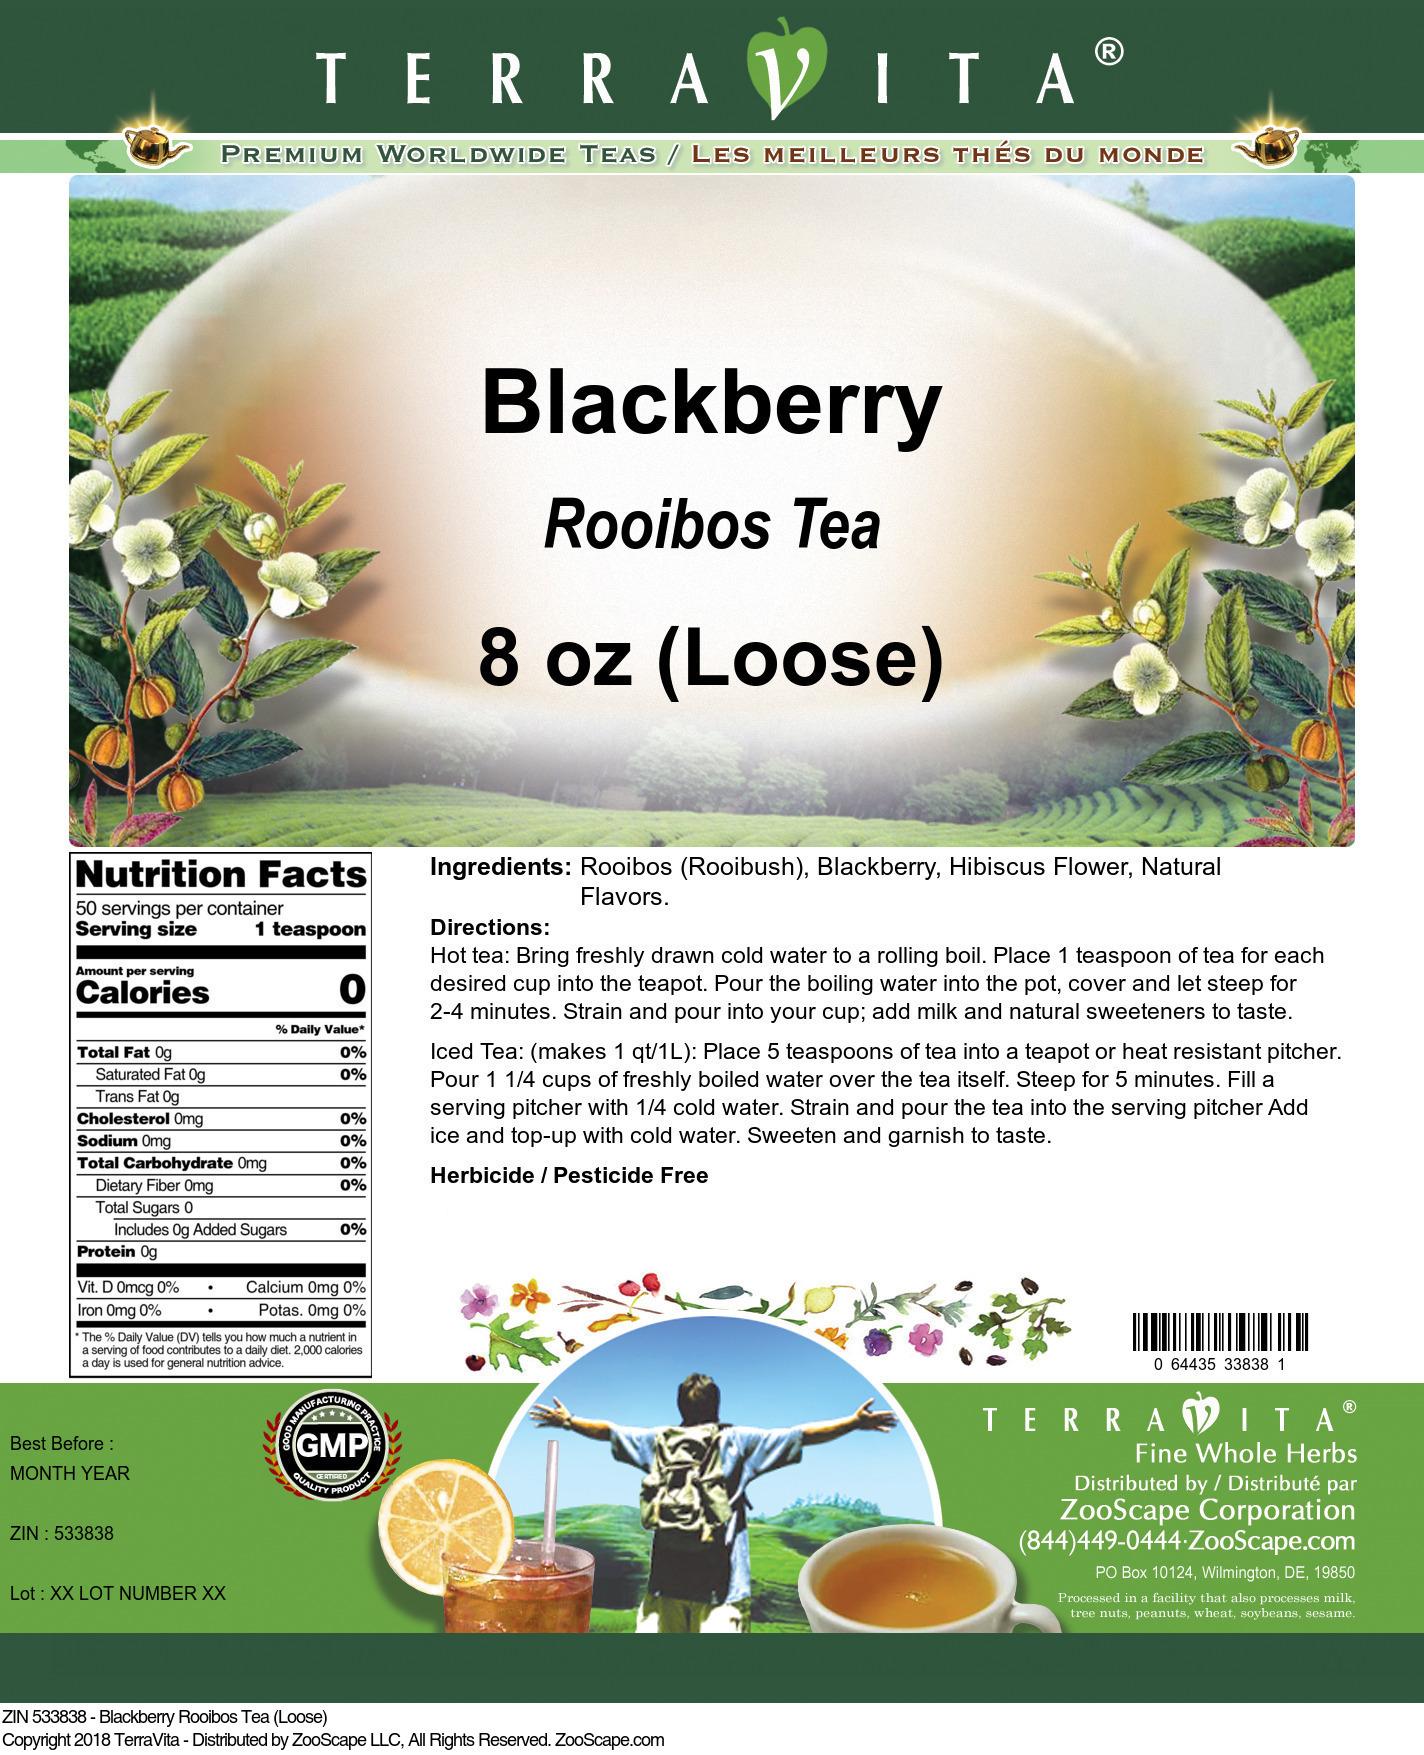 Blackberry Rooibos Tea (Loose)